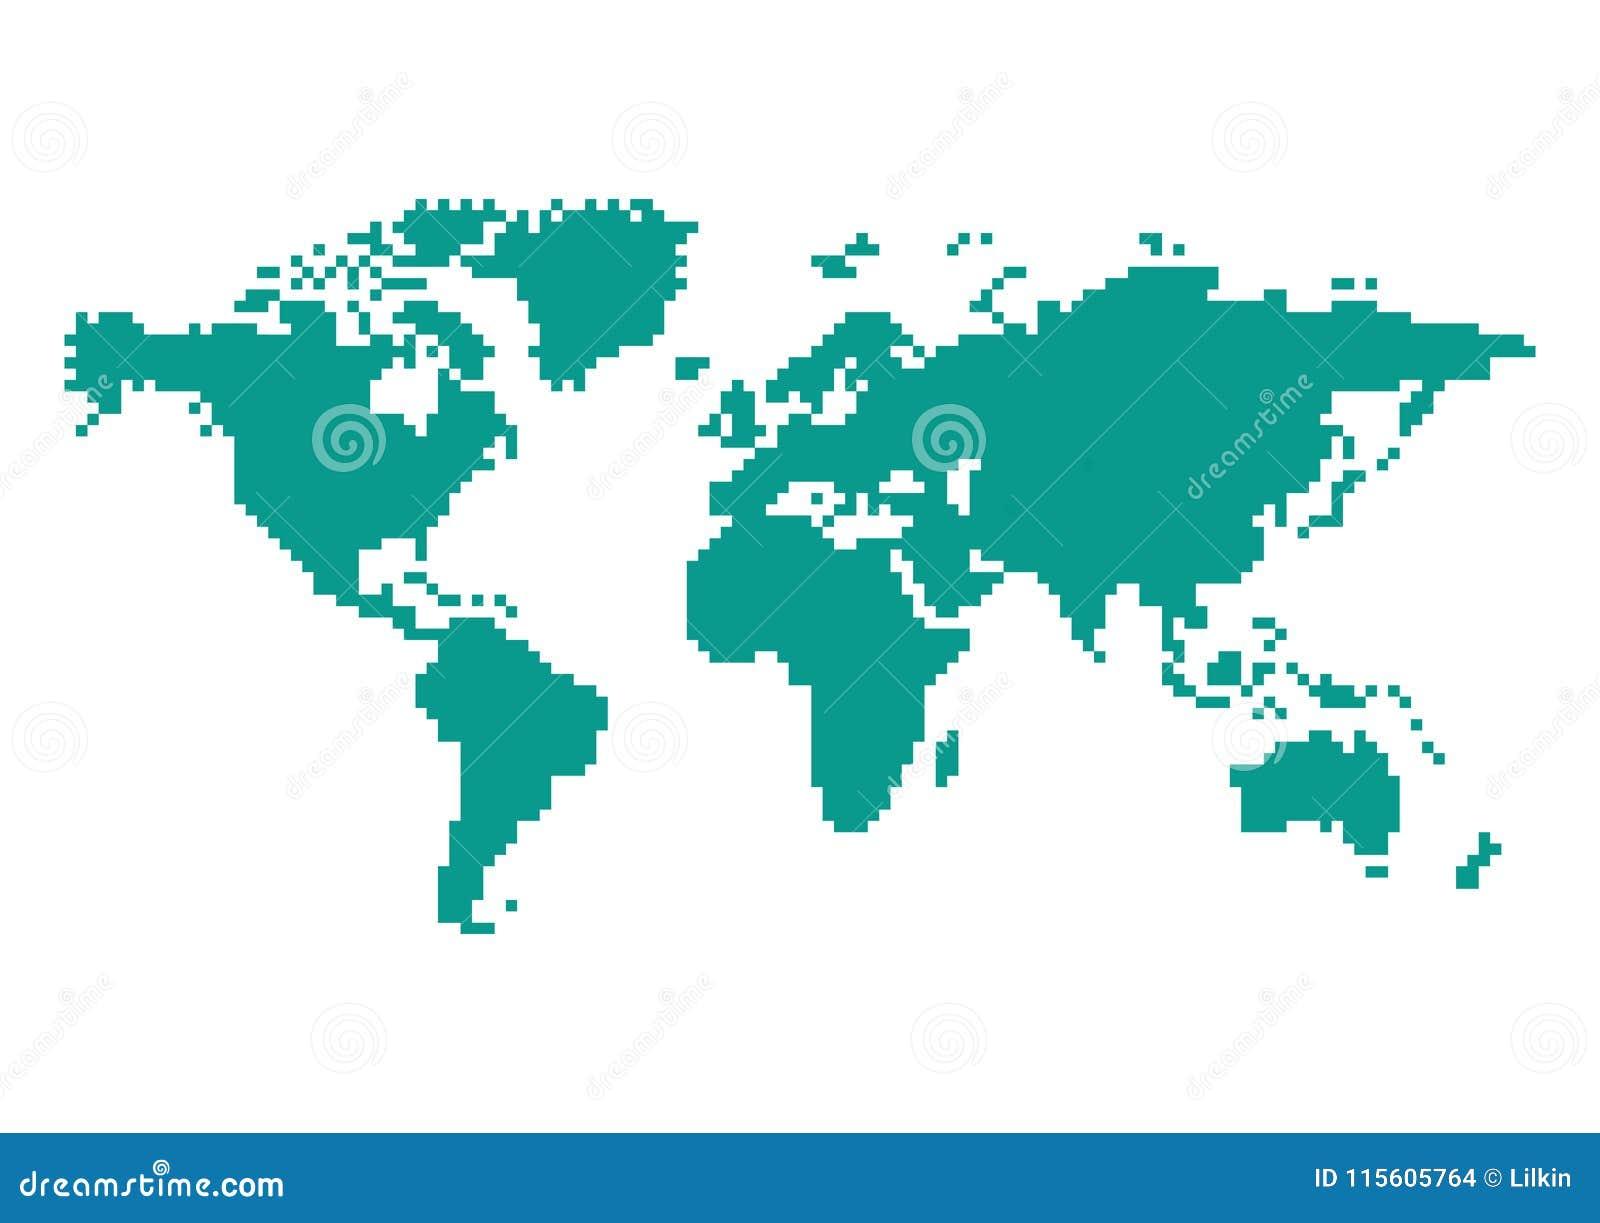 Pixel 8 Bit World Map Illustration Stock Vector   Illustration of